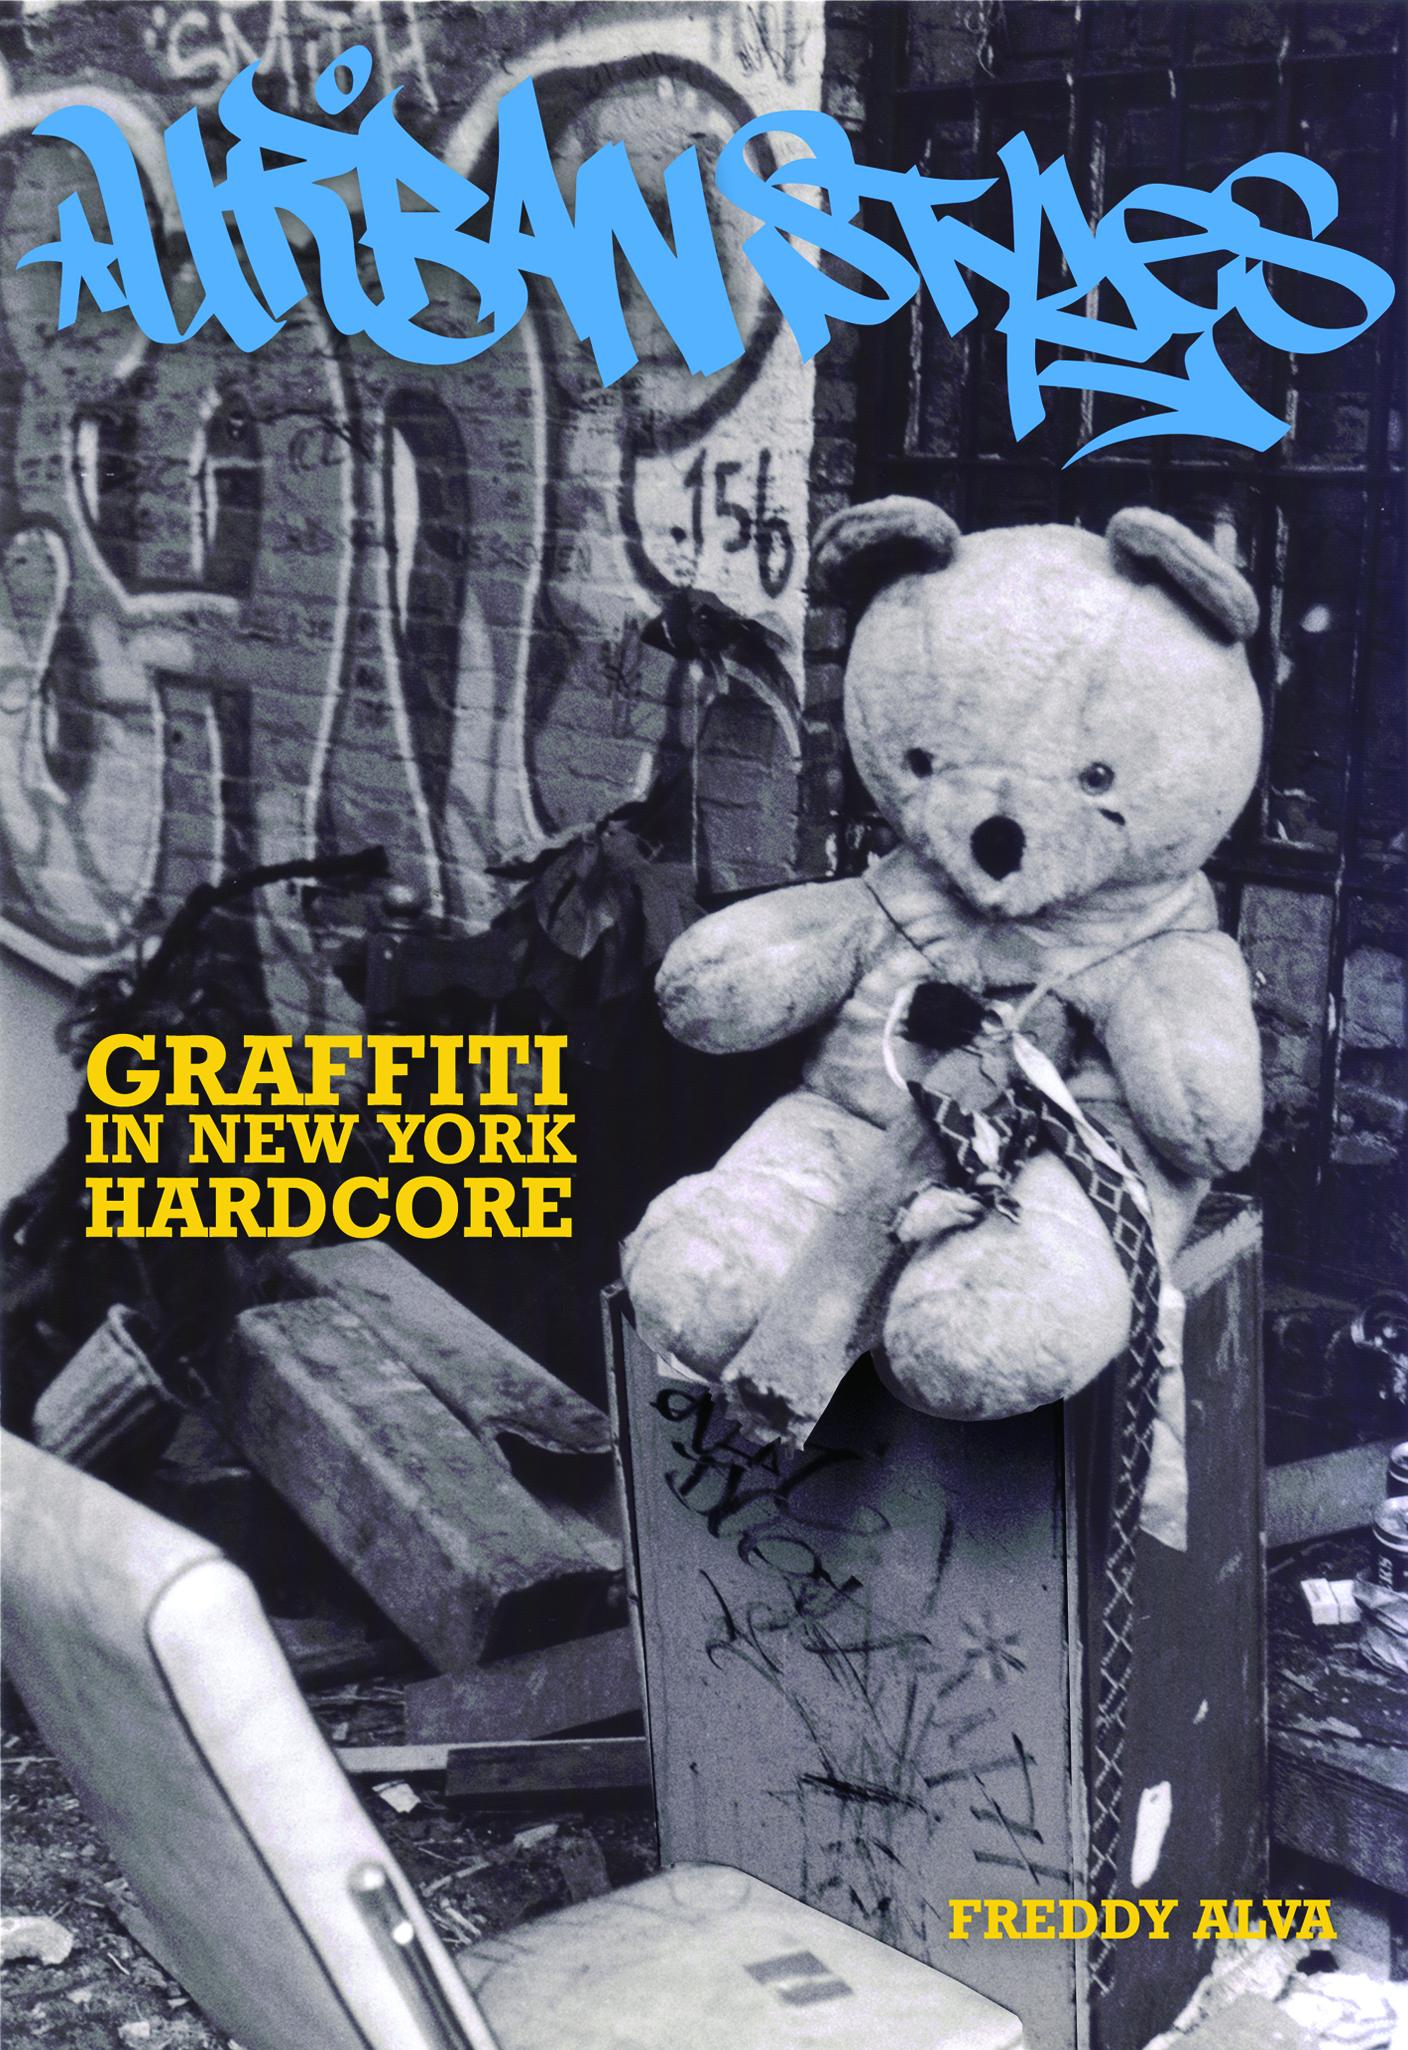 Book Launch & Panel: Urban Styles: Graffiti in New York Hardcore by Freddy Alva — in conversation w/ Sacha Jenkins, EZEC, KR.ONE, JERE, & SMOG